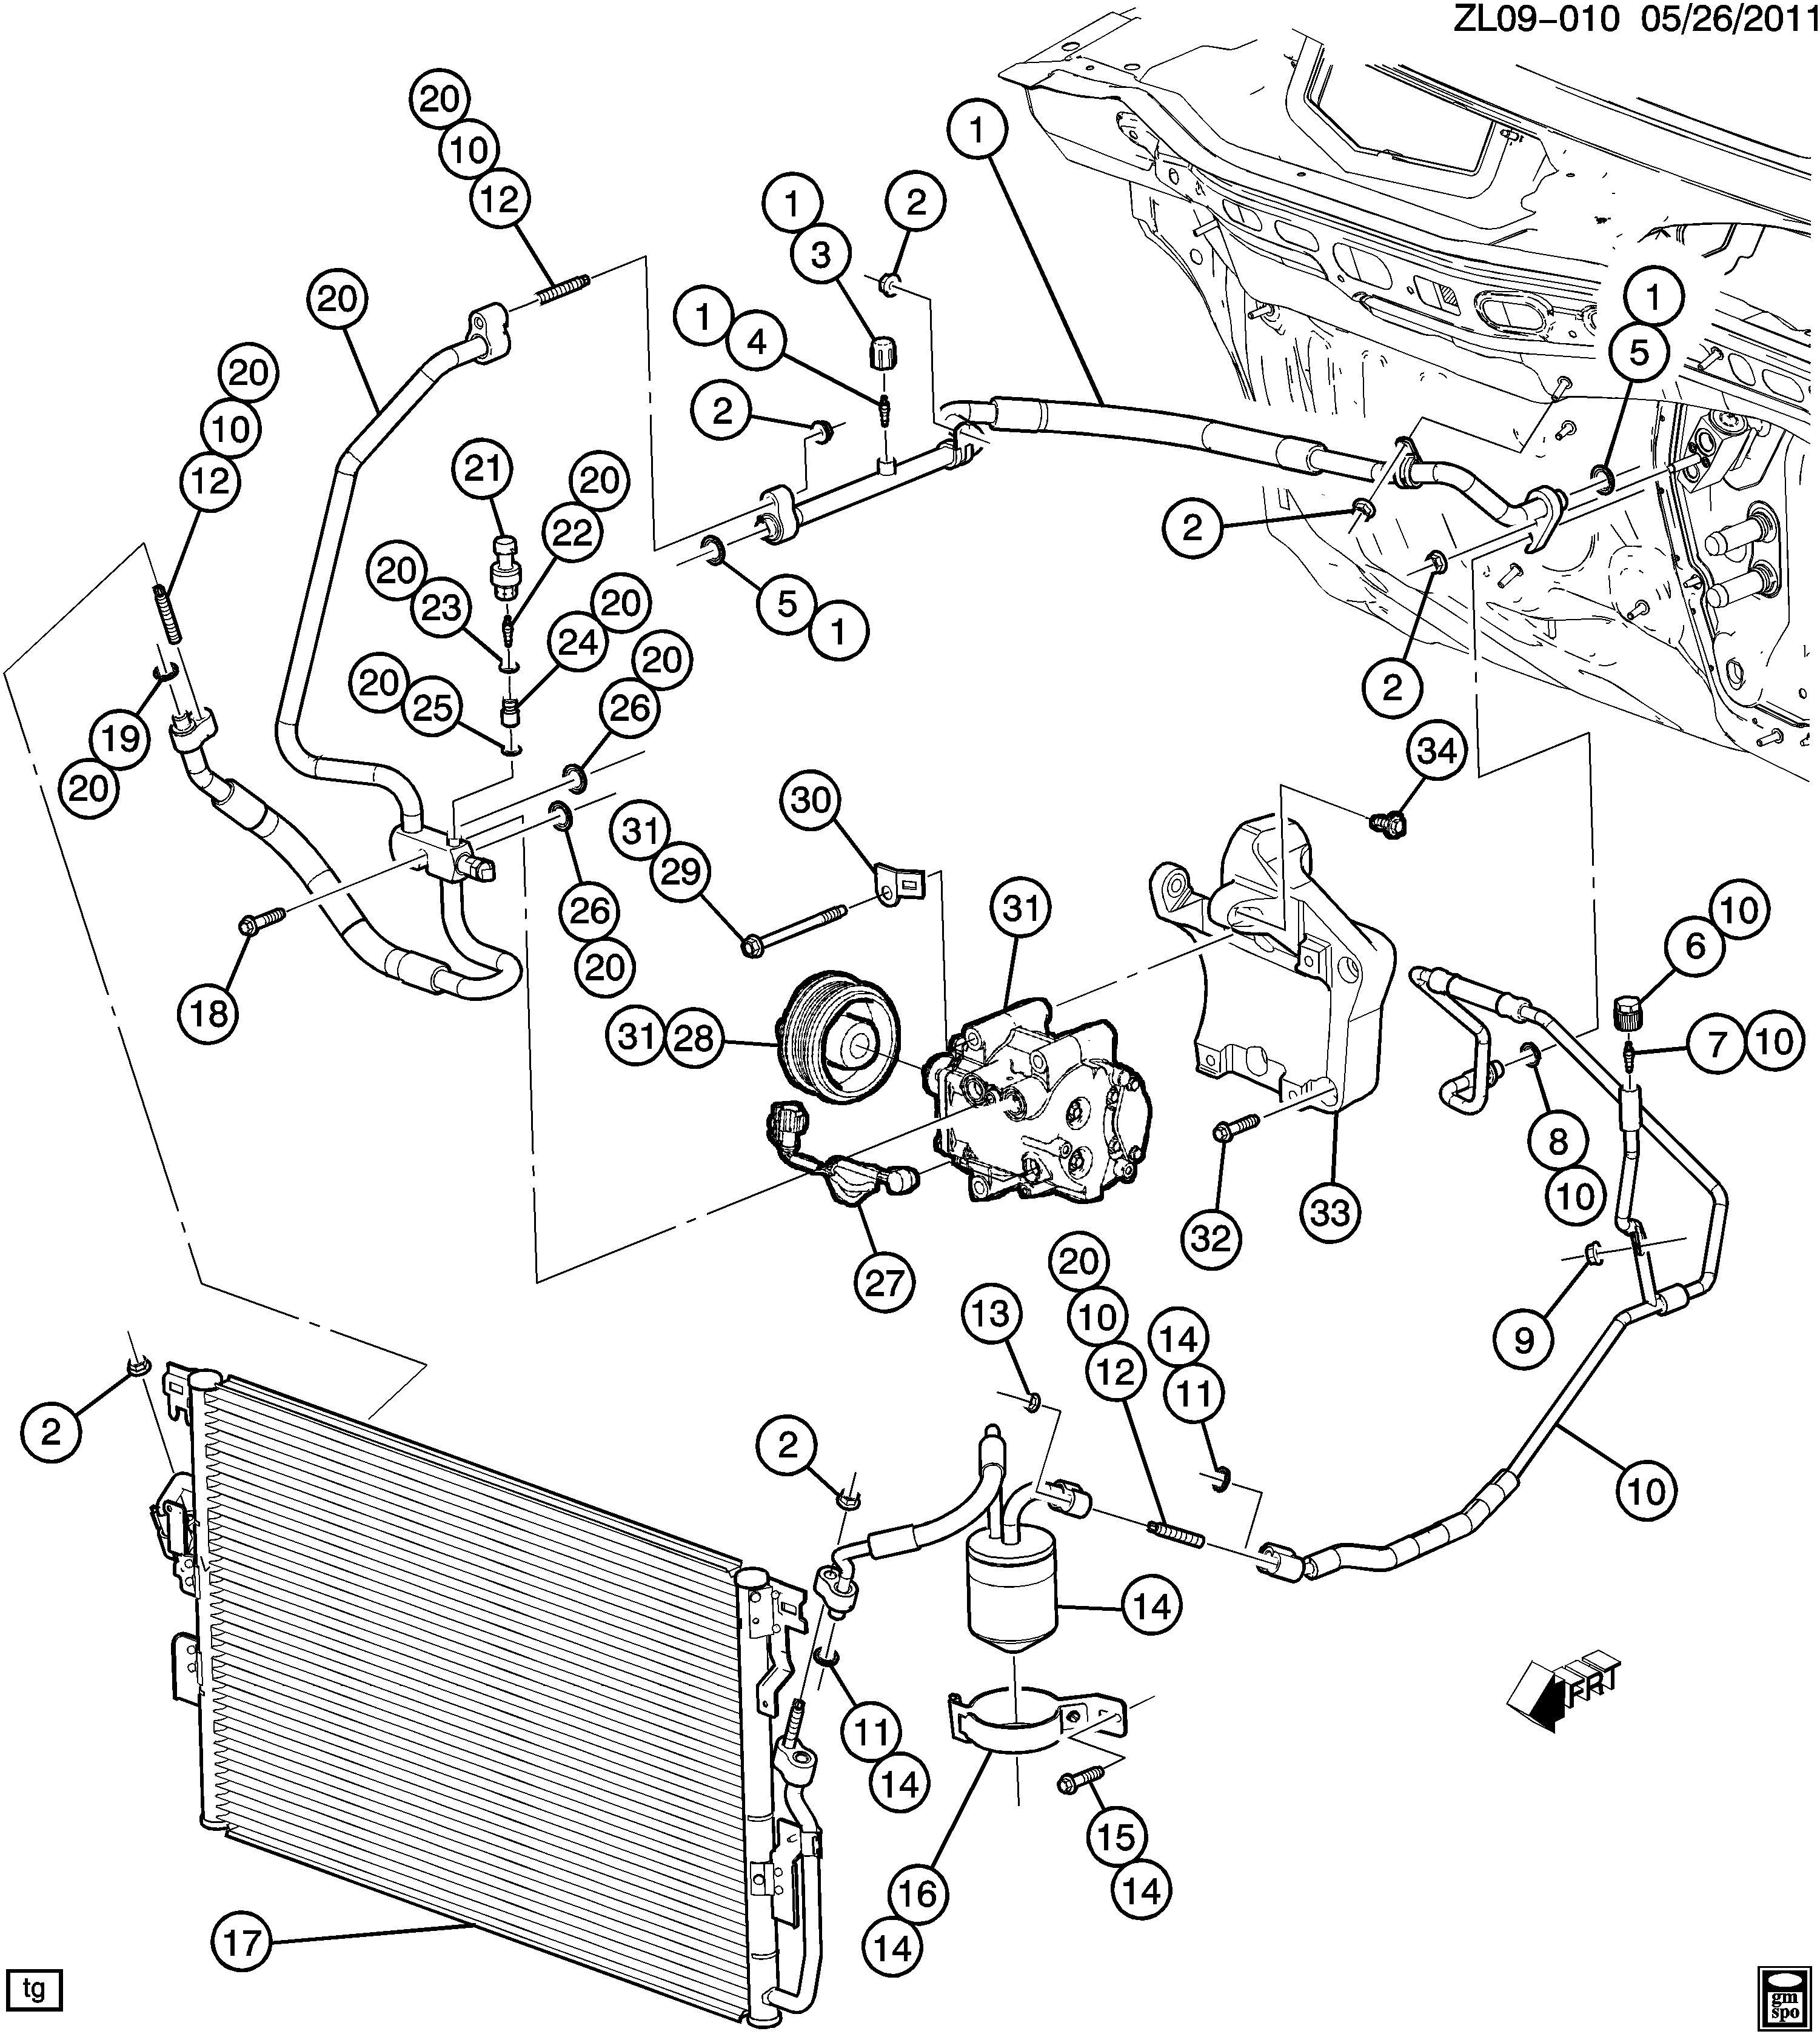 [DIAGRAM_1JK]  OC_4297] Saturn Manual Transmission Diagram Http Wwwtonkinonlinepartscom  Free Diagram | 2007 Saturn Aura 3 5 Engine Water Pump Diagram |  | Leona Tool Mohammedshrine Librar Wiring 101